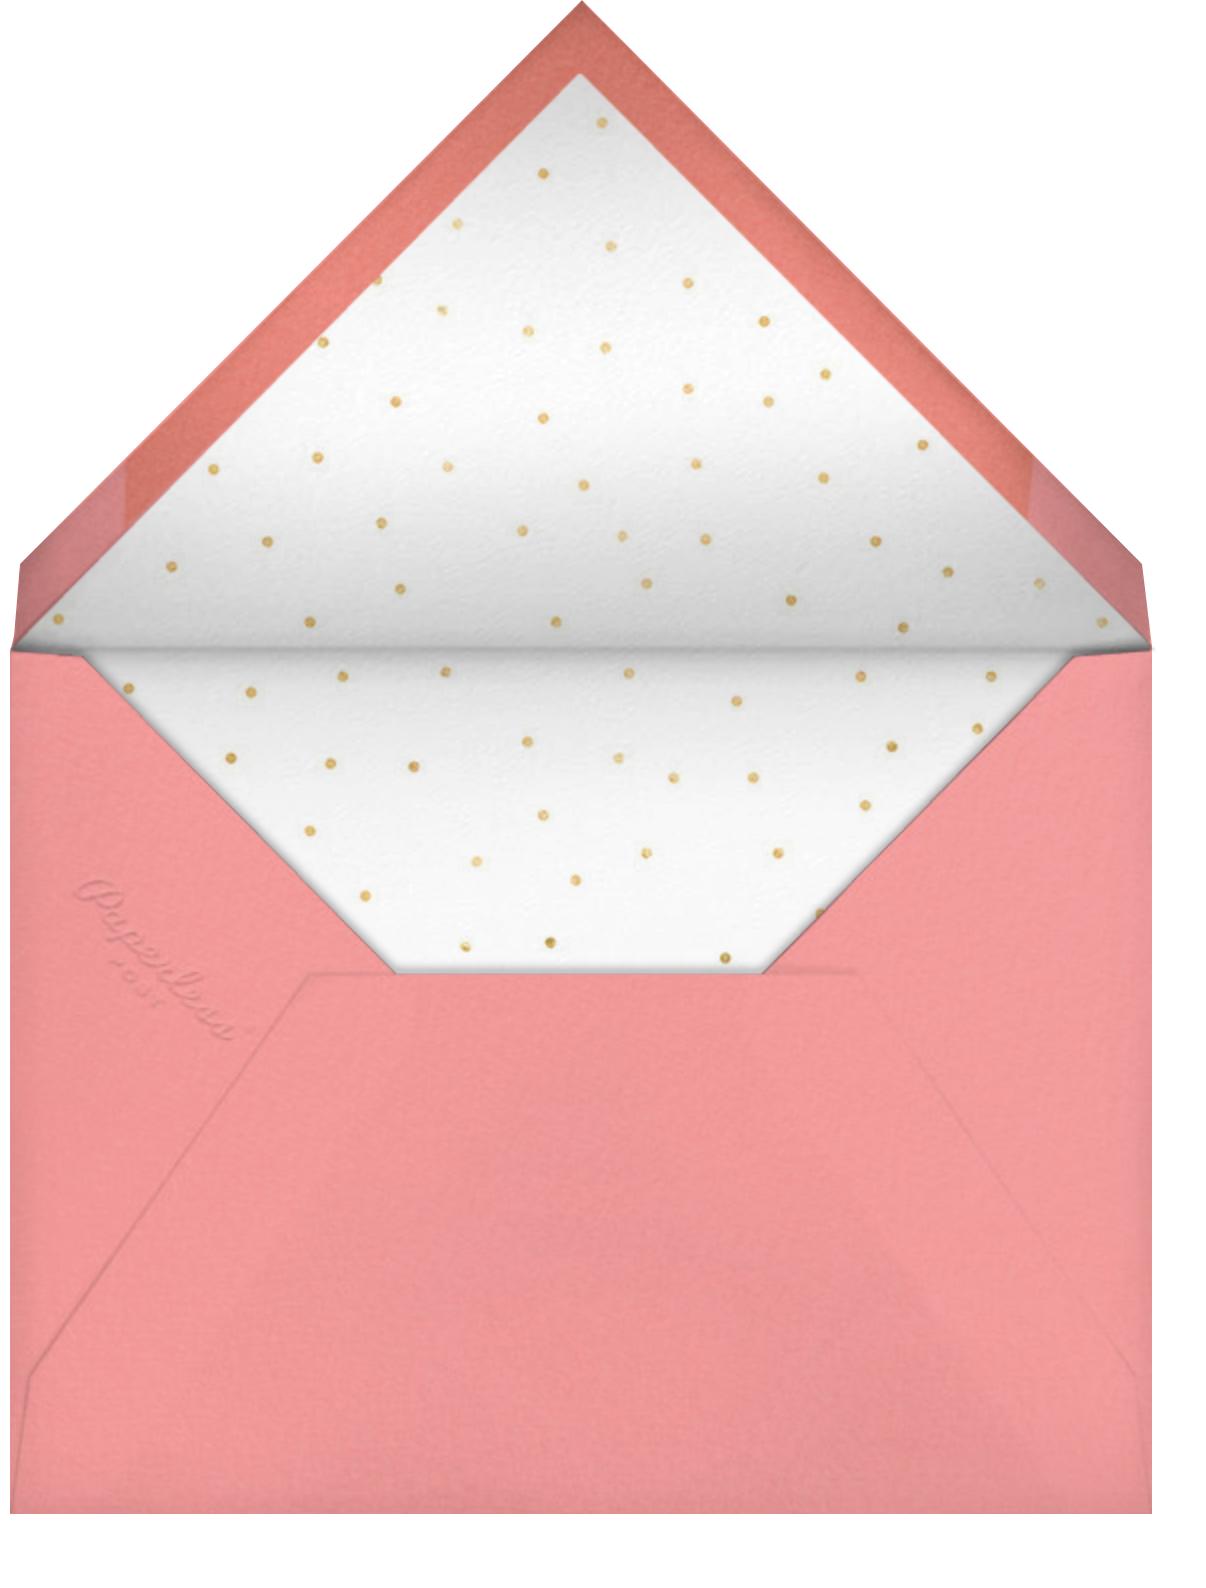 Sweet Tea - Paperless Post - Bridal shower - envelope back